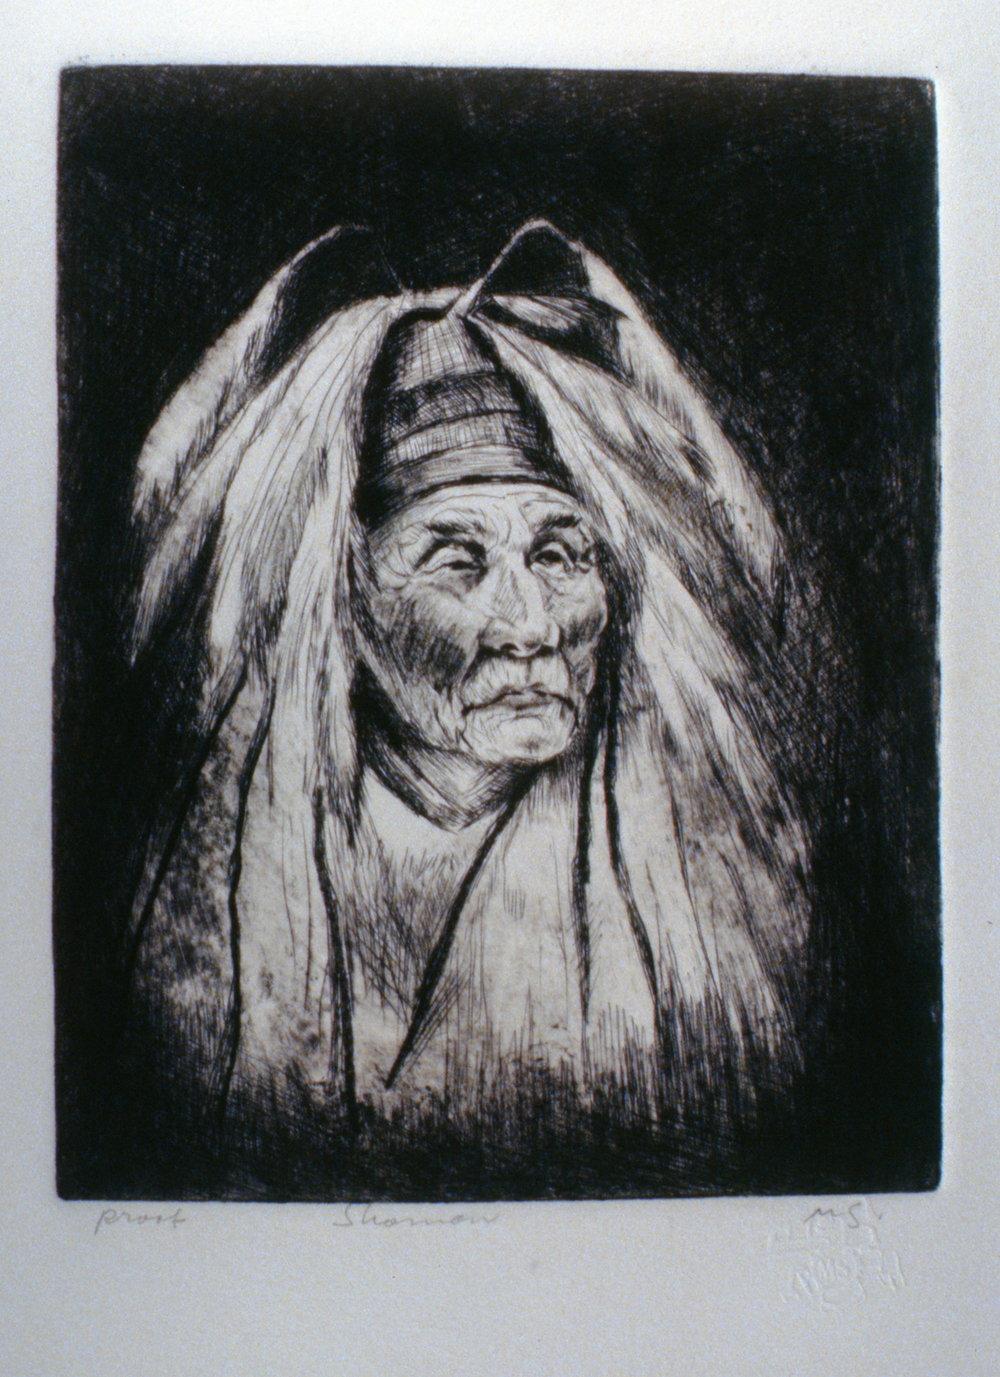 Shaman, 1980, Minn Sjløseth, artist proof, 25 x 20 cm, 1996.02.10